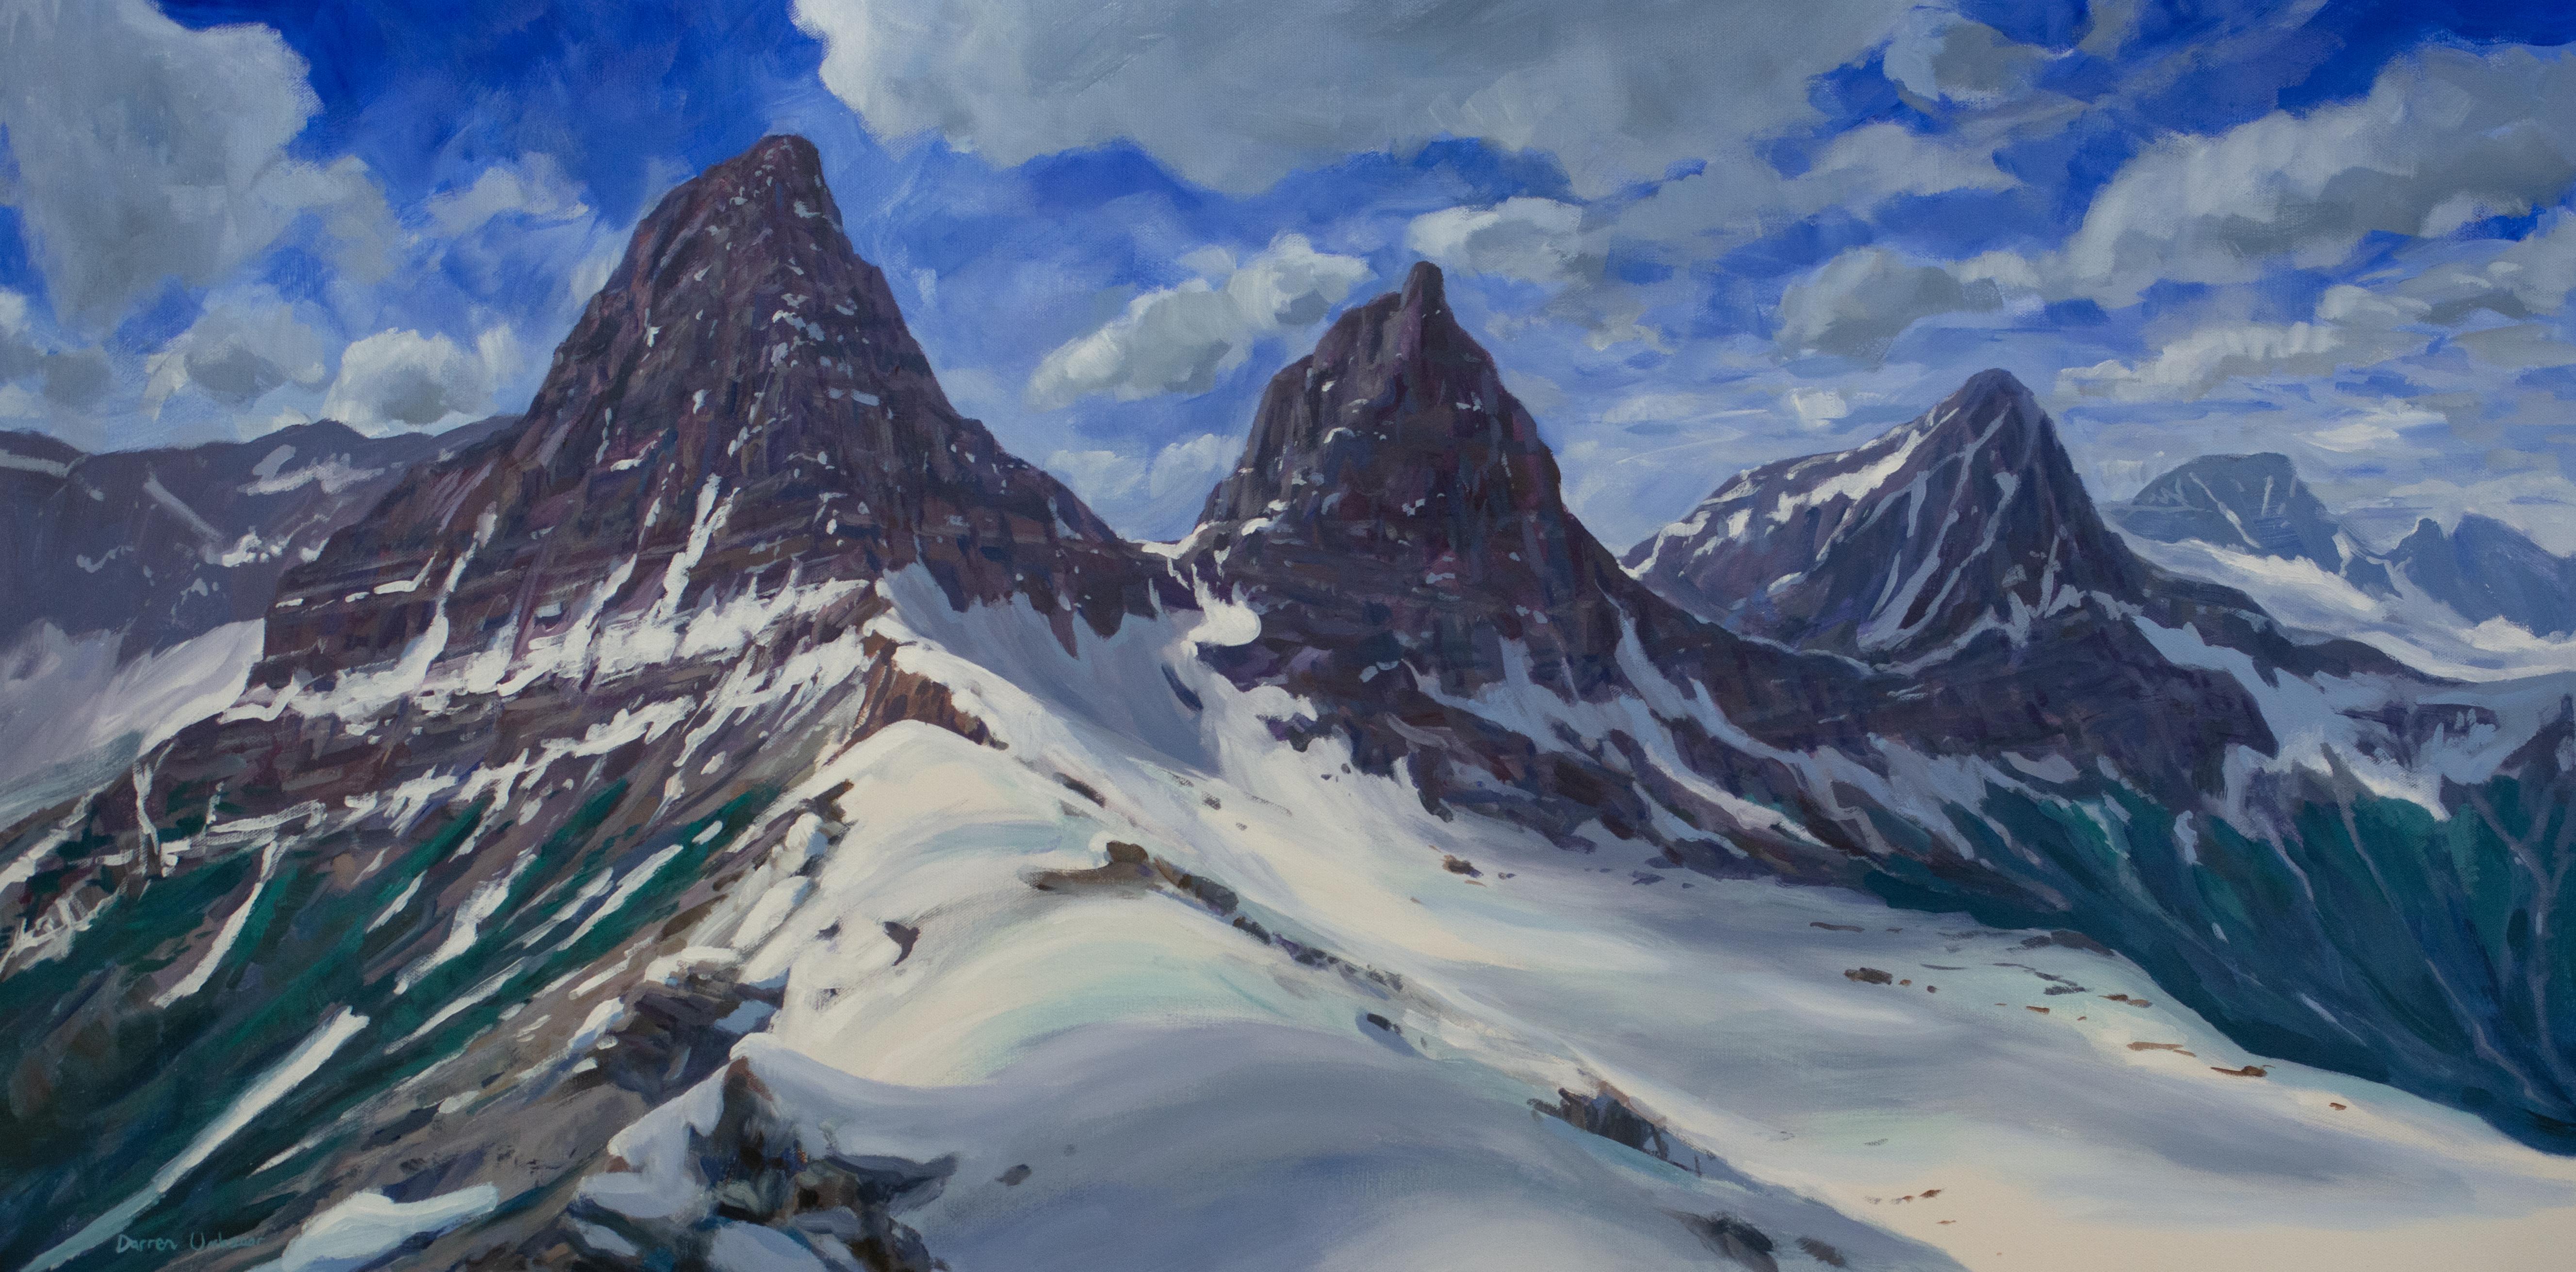 Whitetail Peaks Panorama